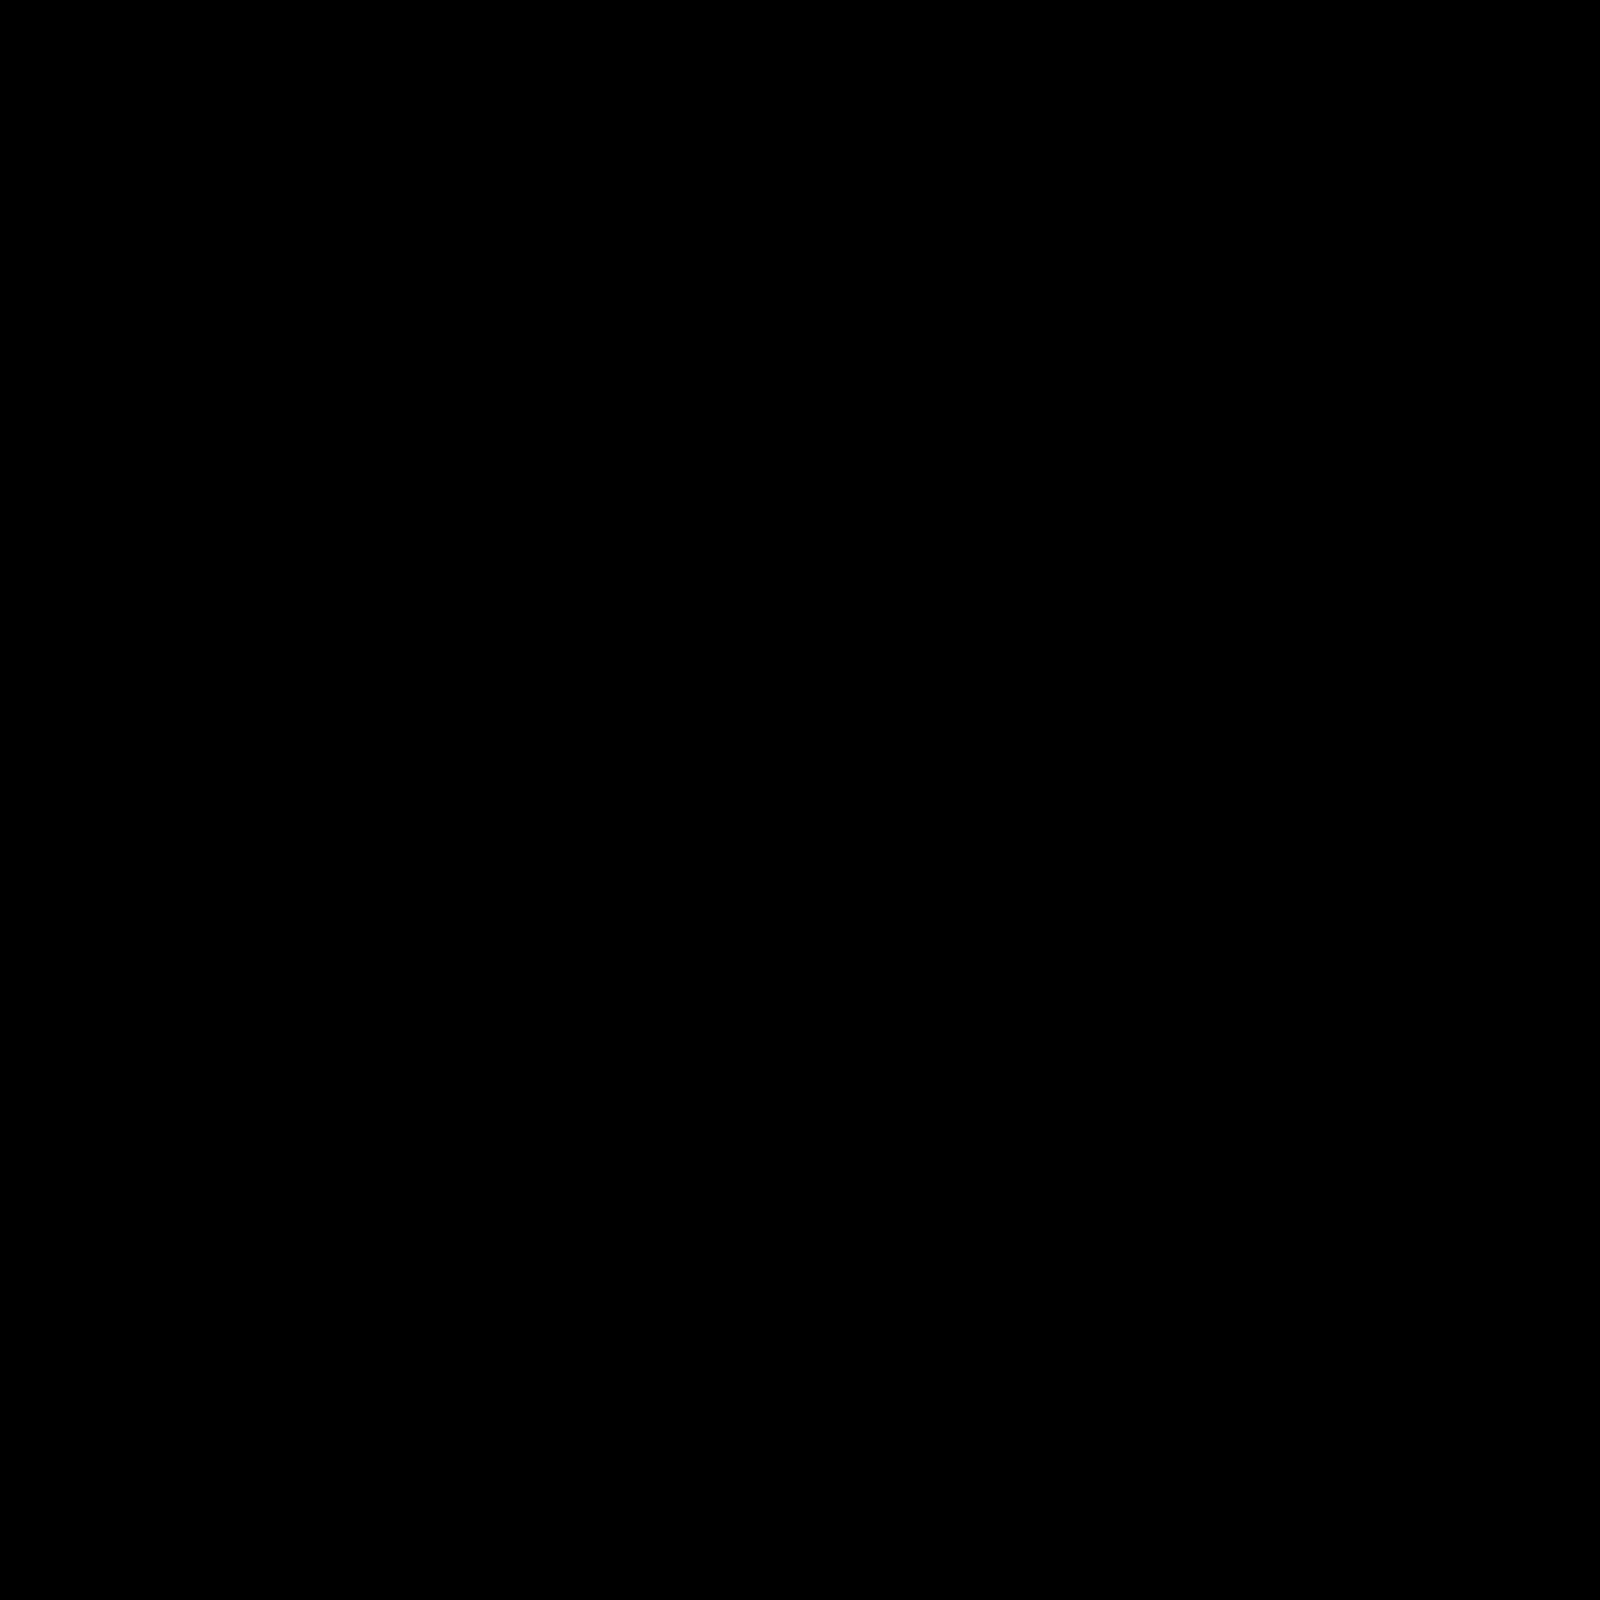 Torpedo Filled icon